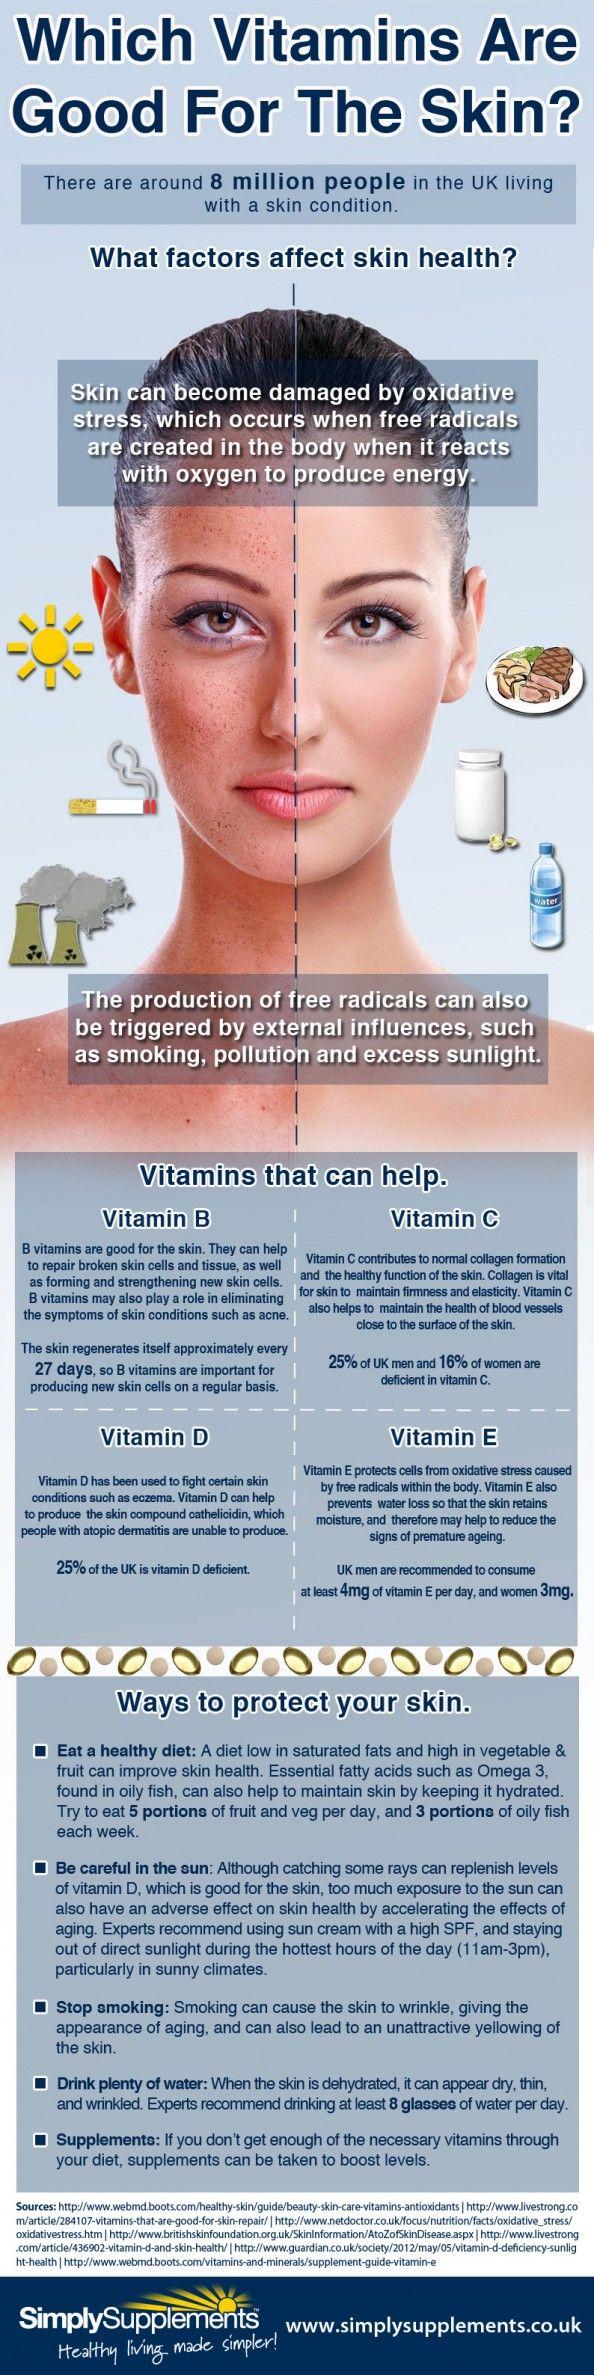 Vitamins for skin.